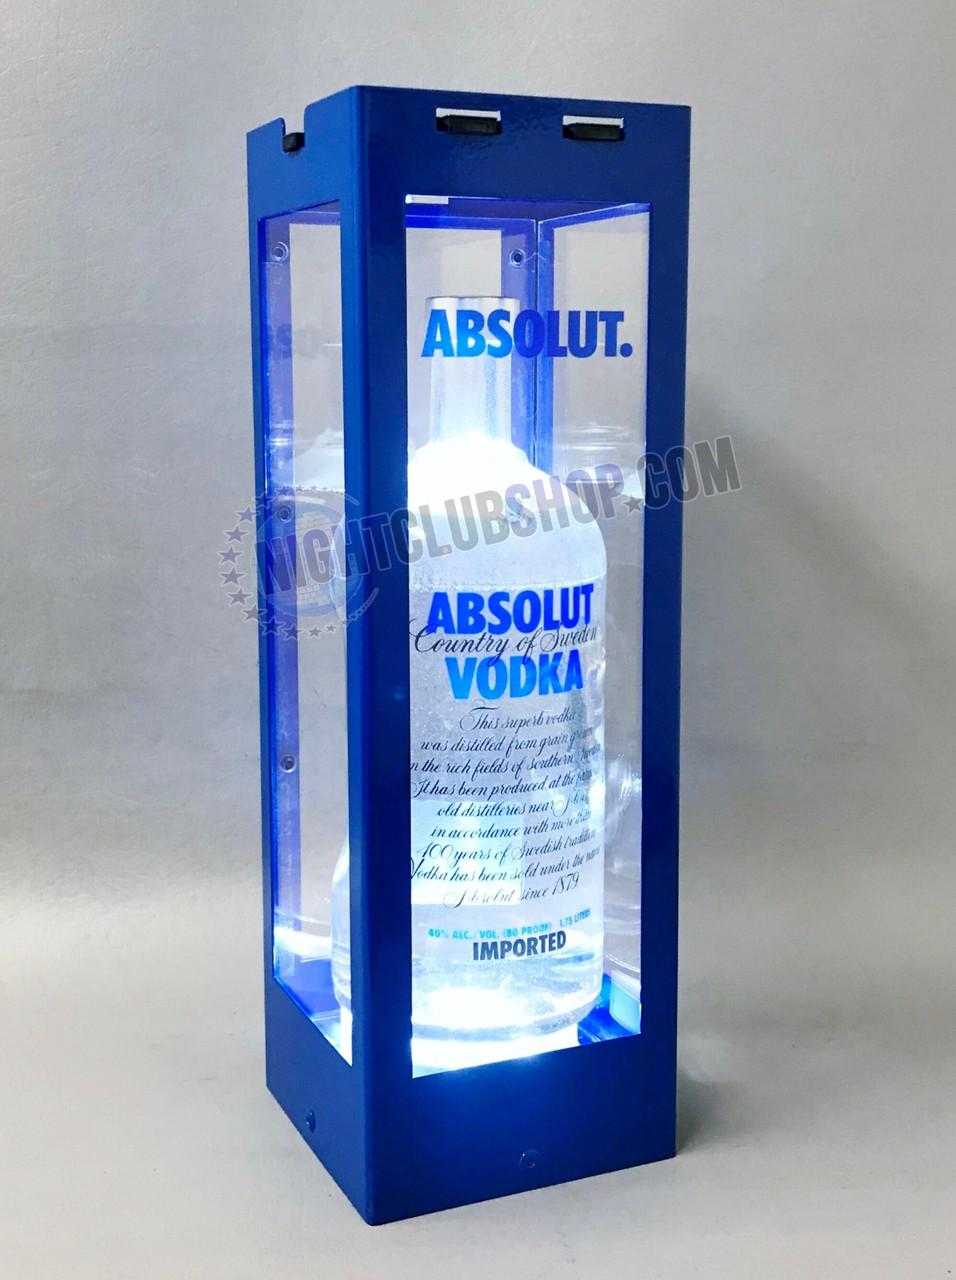 Bottle lock, cage lock, Window  display, bottle service, VIP, LED, state law 1,2,3, nightclub, bar, casino, Spirts, Patrons,